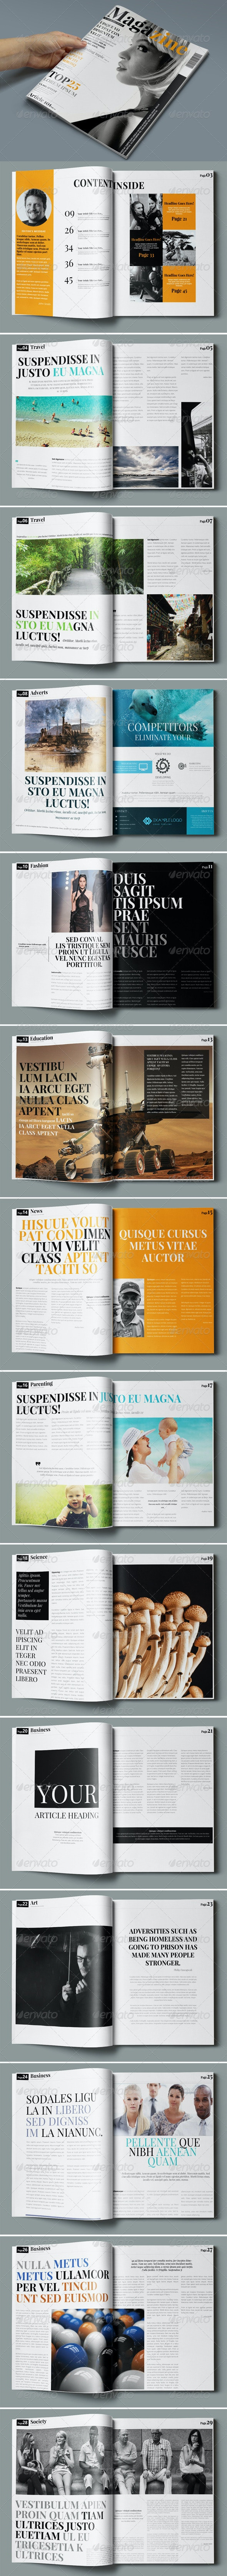 30 Pages Creative Magazine - Magazines Print Templates